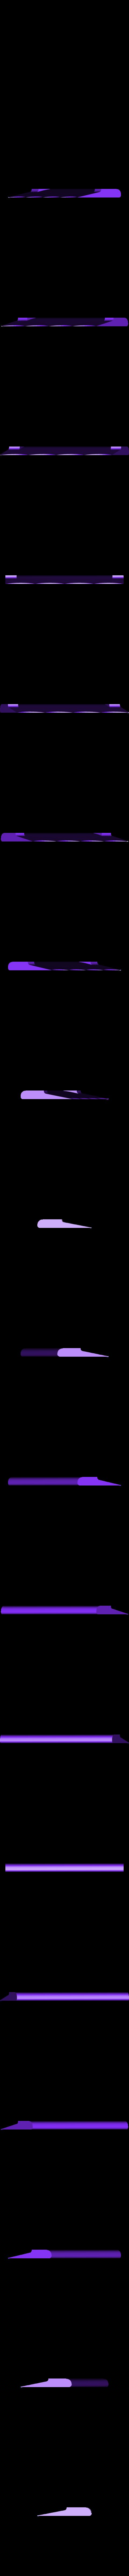 10-29-10004.STL Télécharger fichier STL gratuit Fokker DR.1 Triplane • Design imprimable en 3D, Ventwallader